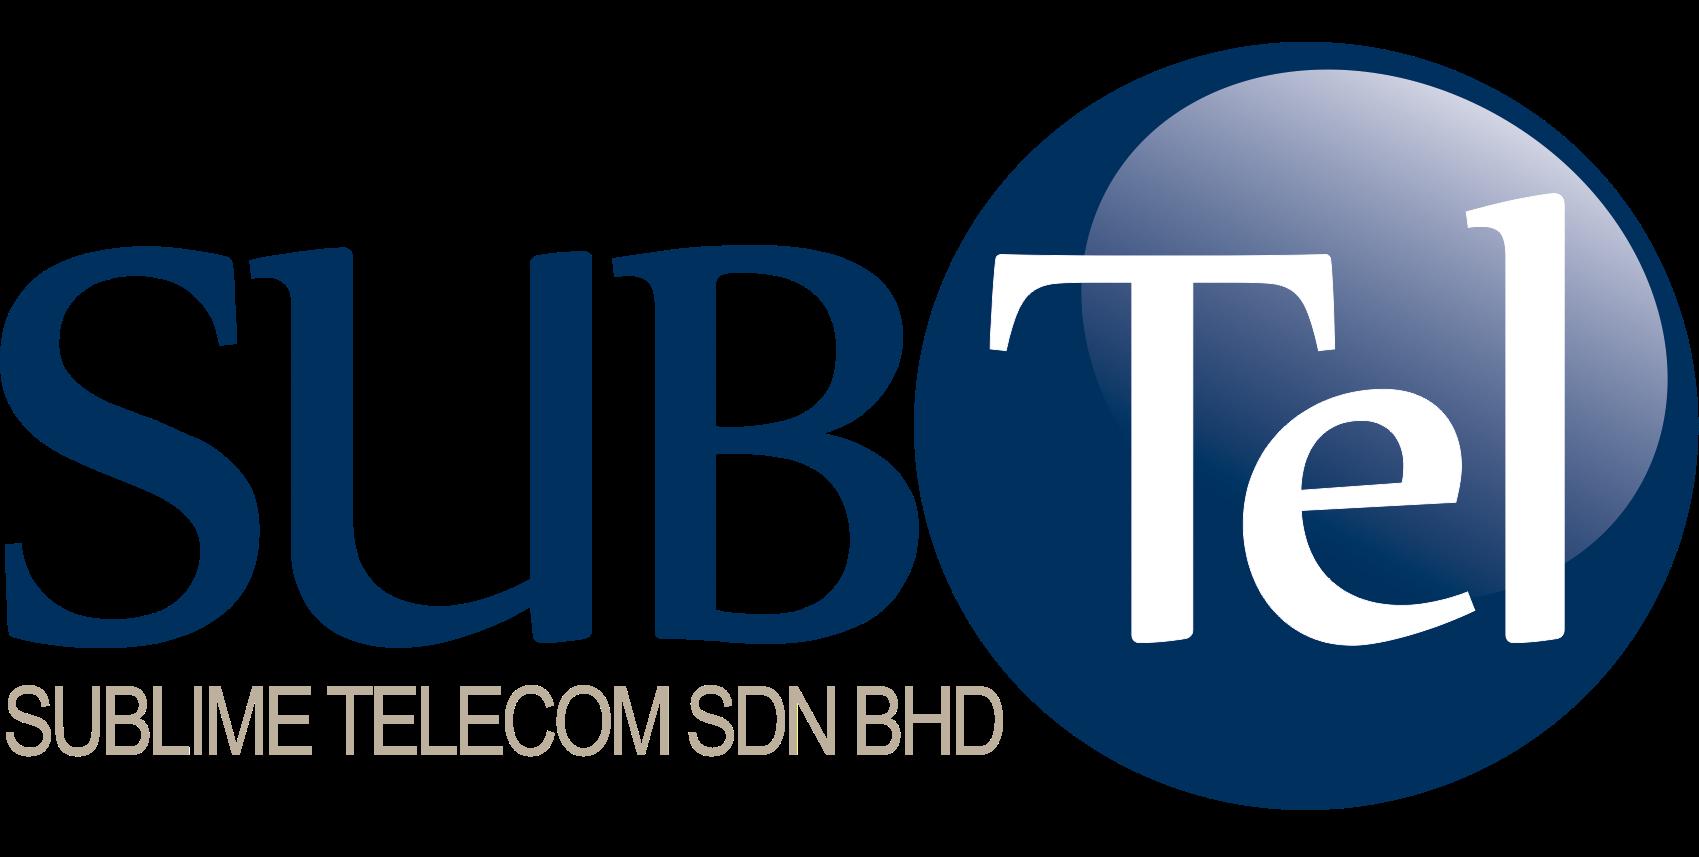 Sublime Telecom Sdn. Bhd.